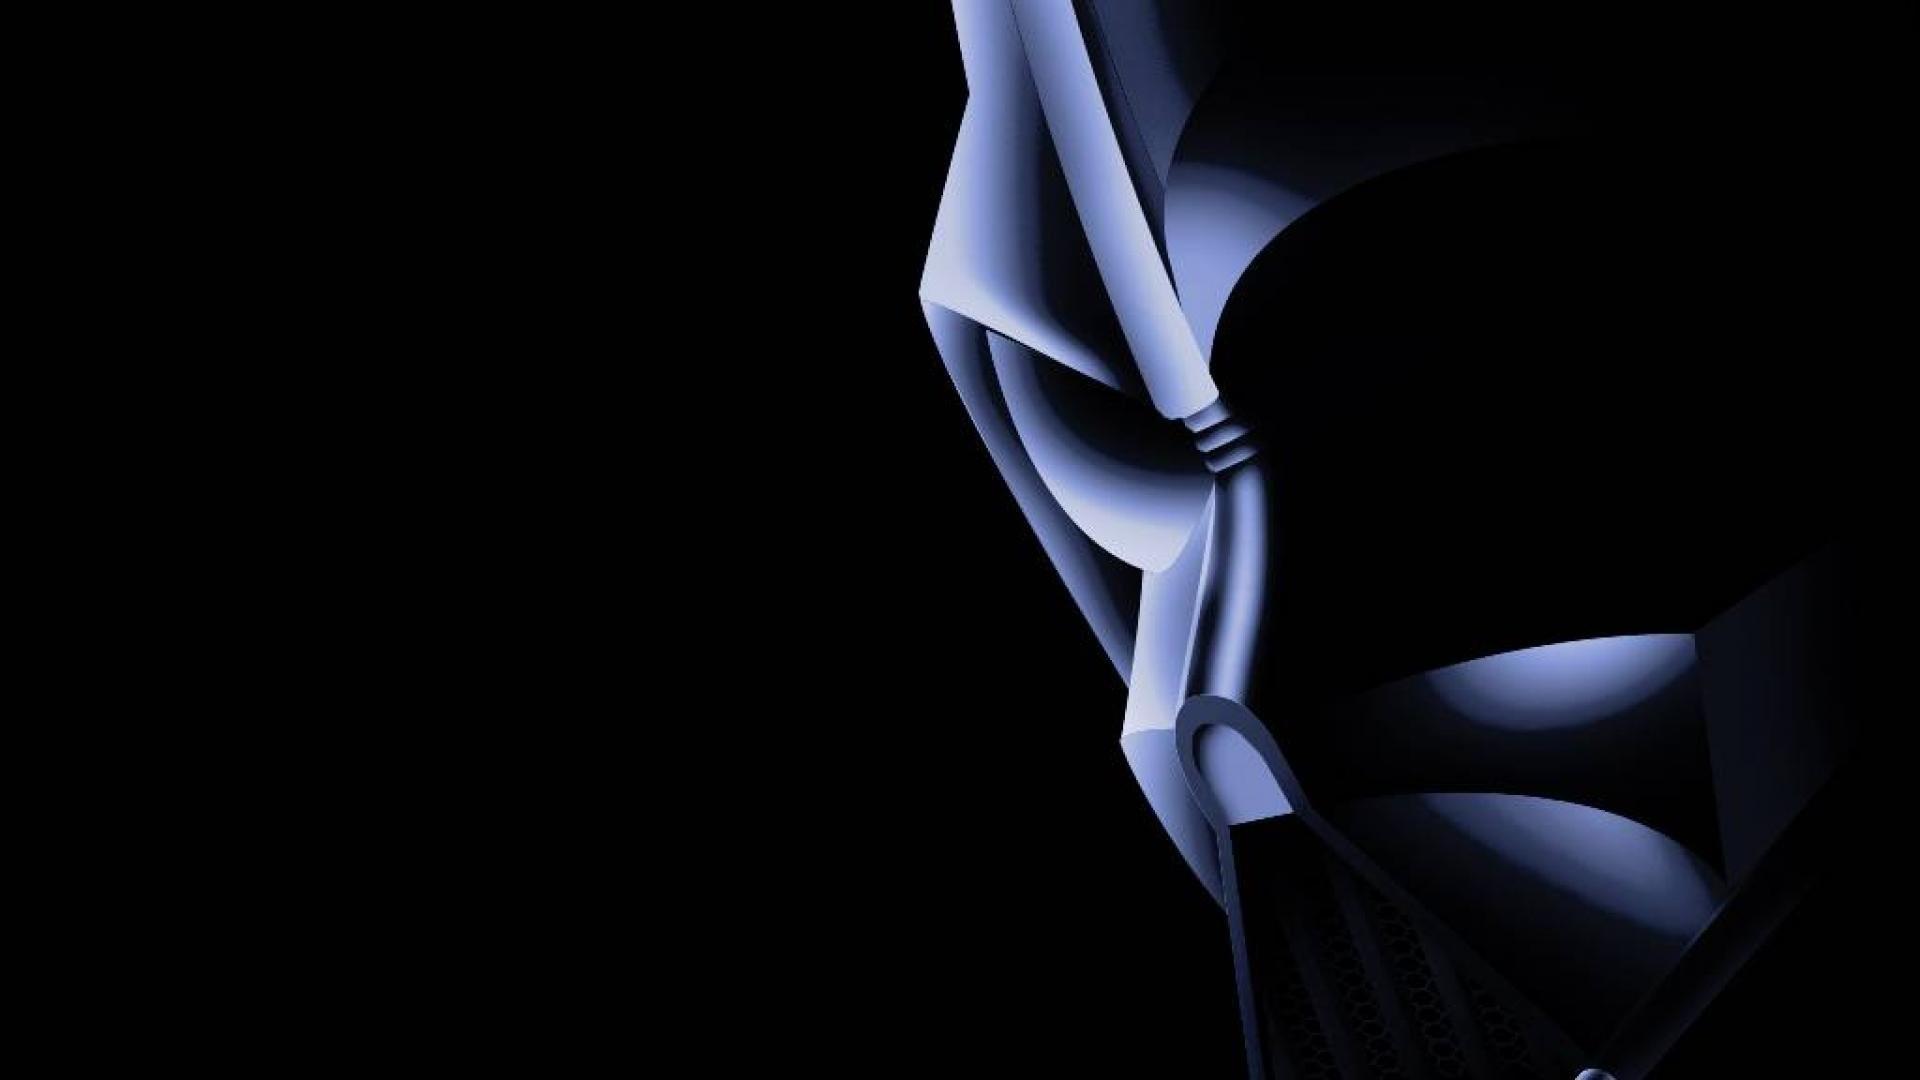 Darth Vader Wallpaper Iphone: Darth Vader Wallpaper HD 1920x1080 ·① Download Free